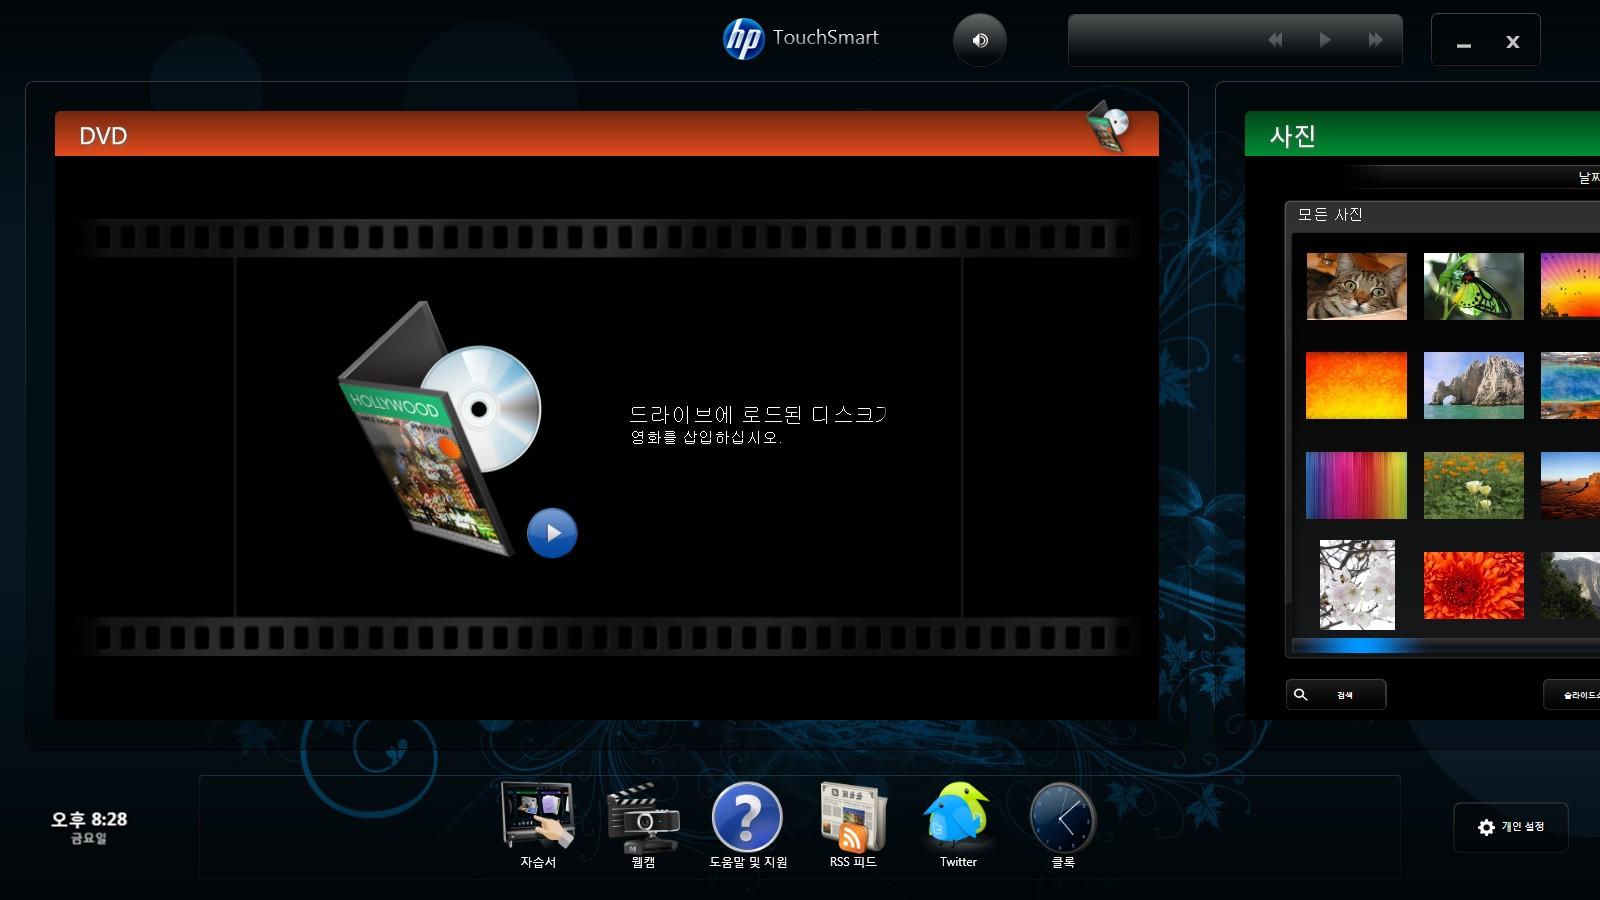 DVD, 사진